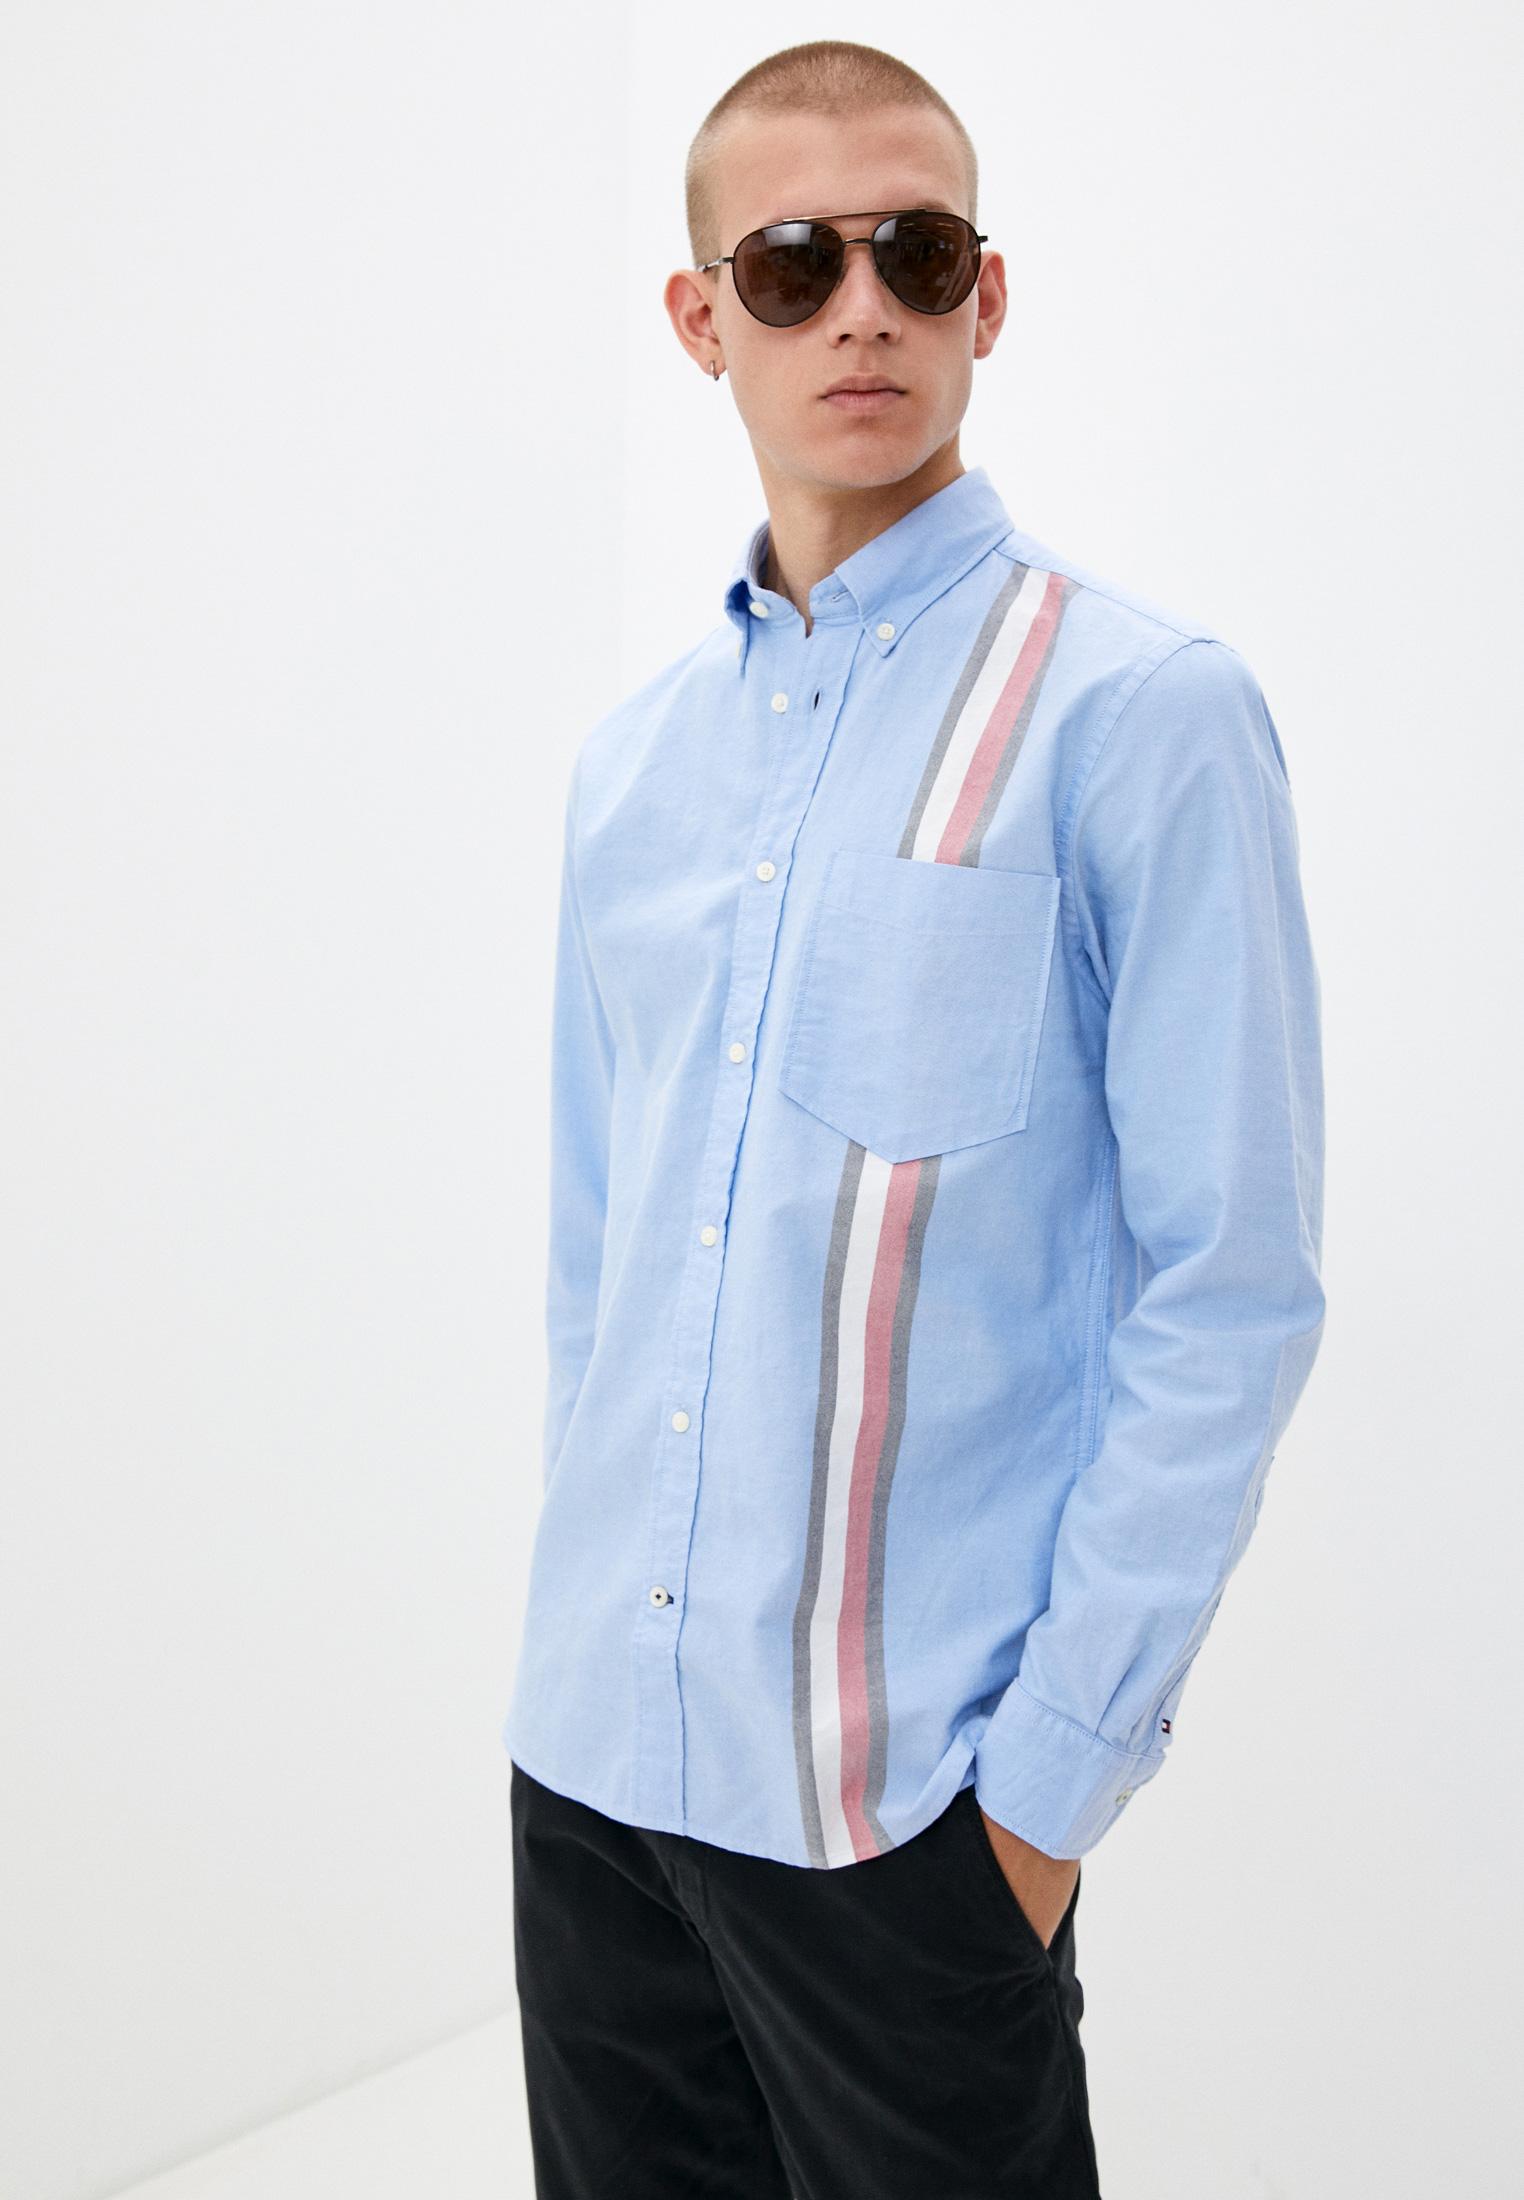 Рубашка с длинным рукавом Tommy Hilfiger (Томми Хилфигер) MW0MW19397